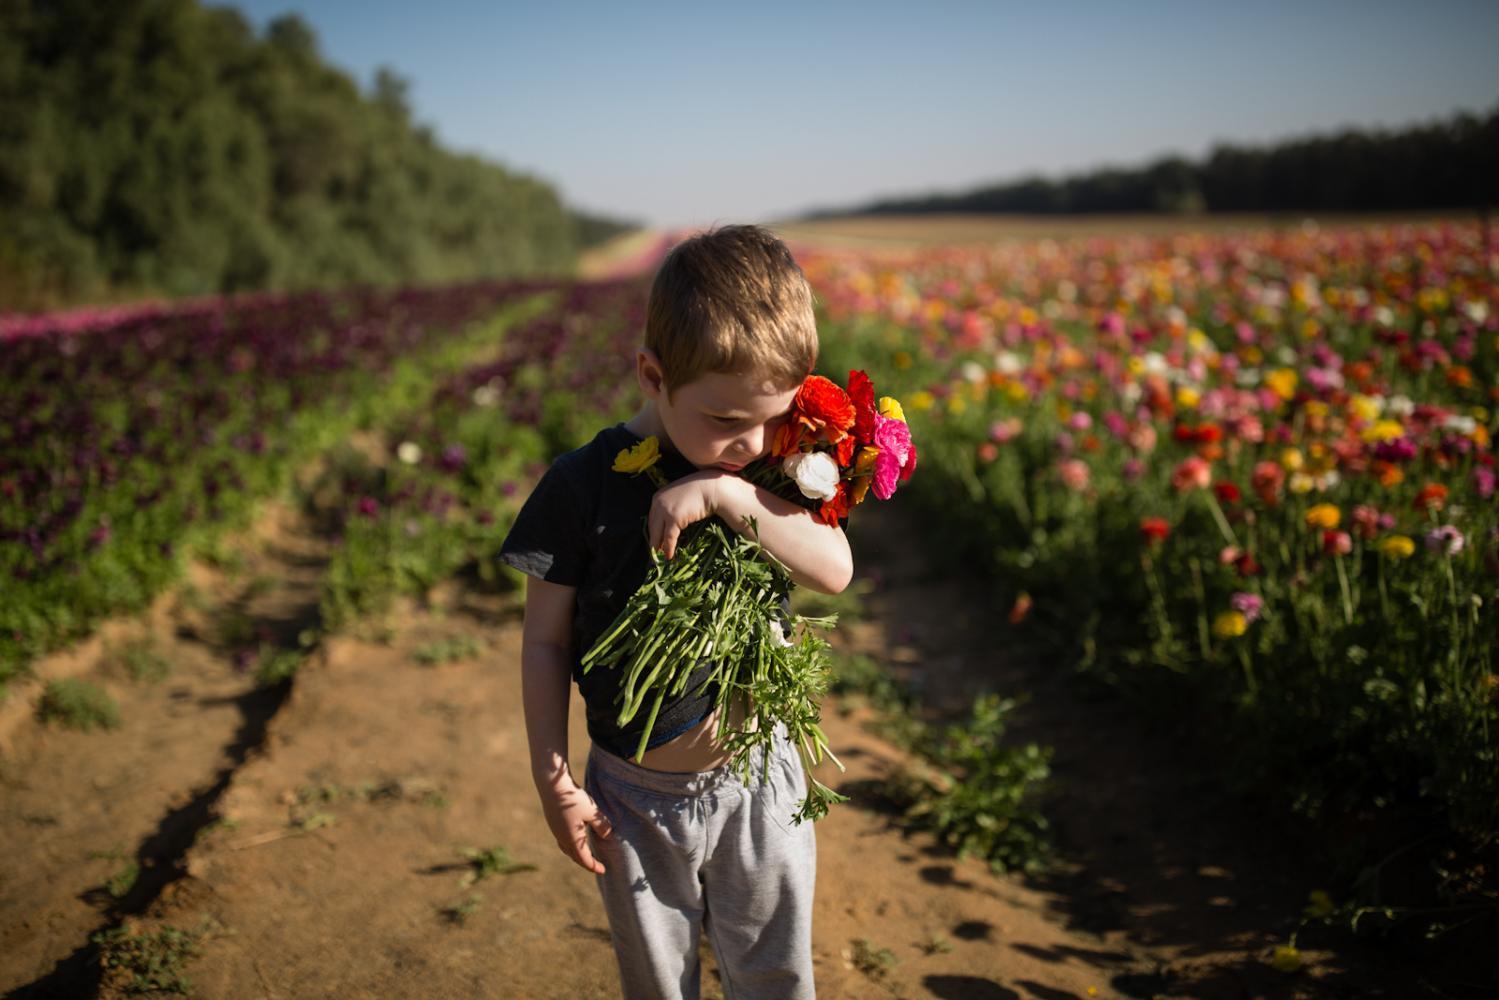 Photography image - Loading 6d156858d350f113-CK_Gaza_Border_36.jpg